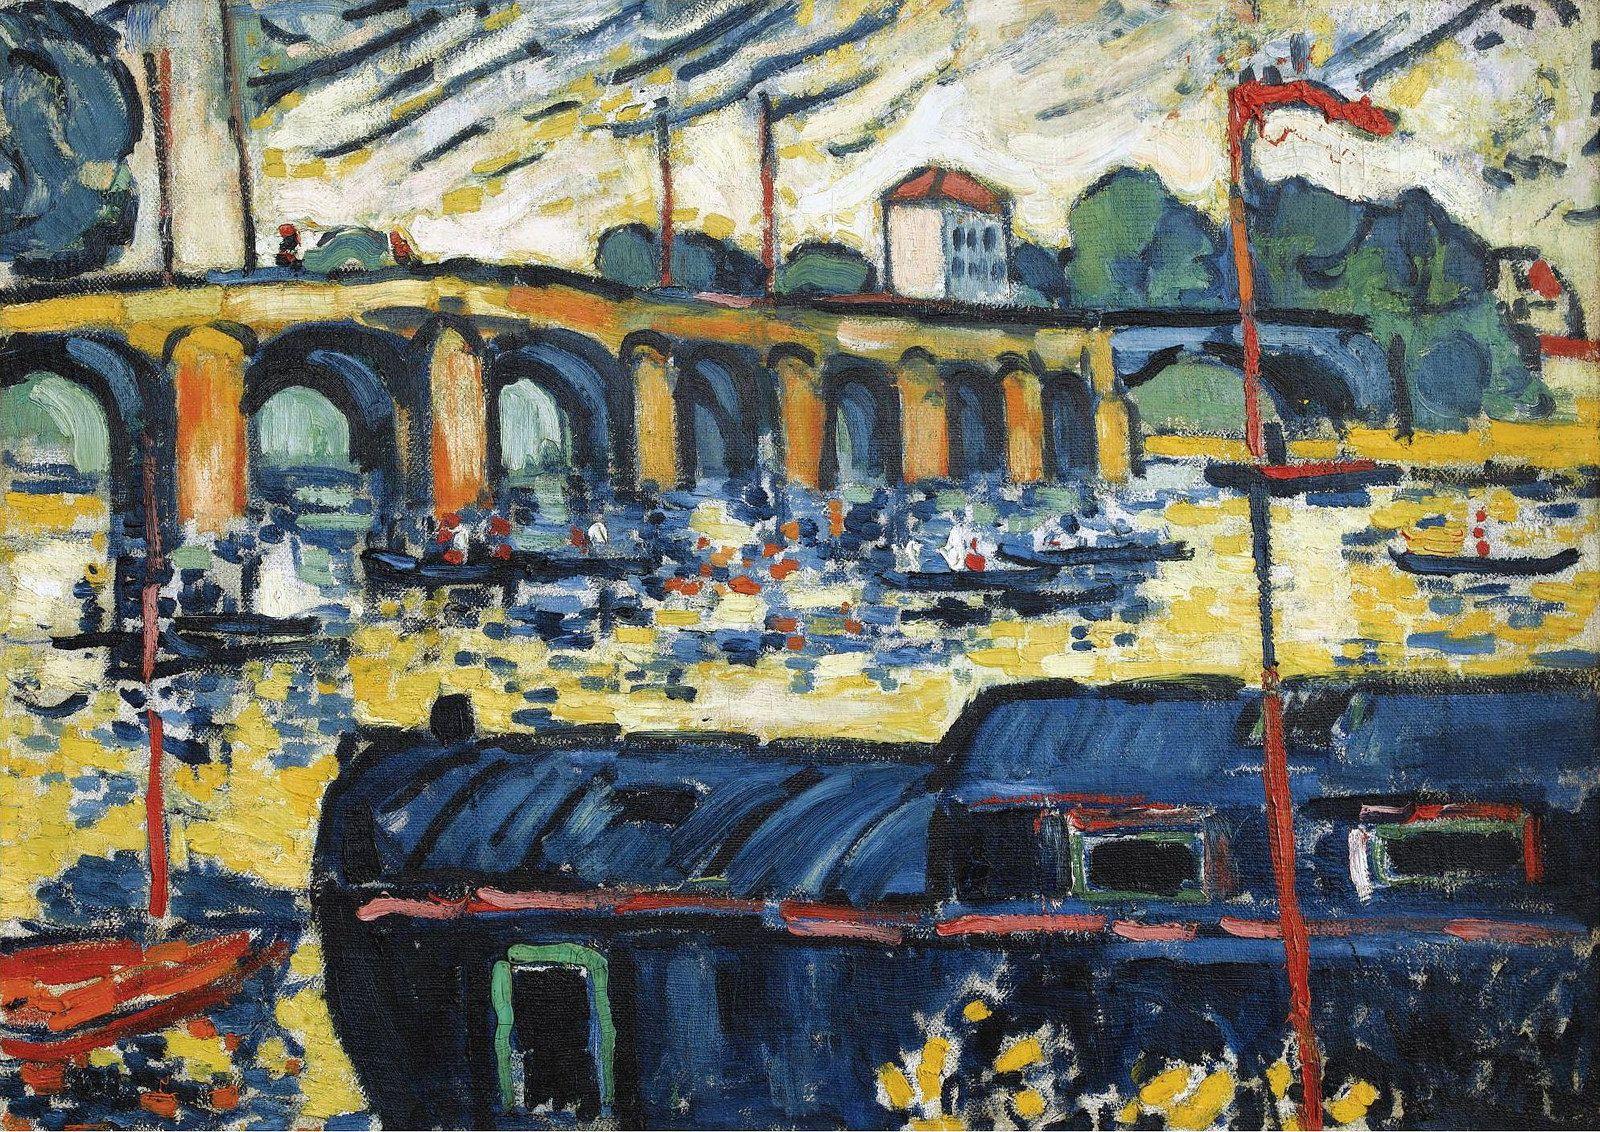 The Bridge of Poissy, 1905. Maurice de Vlaminck